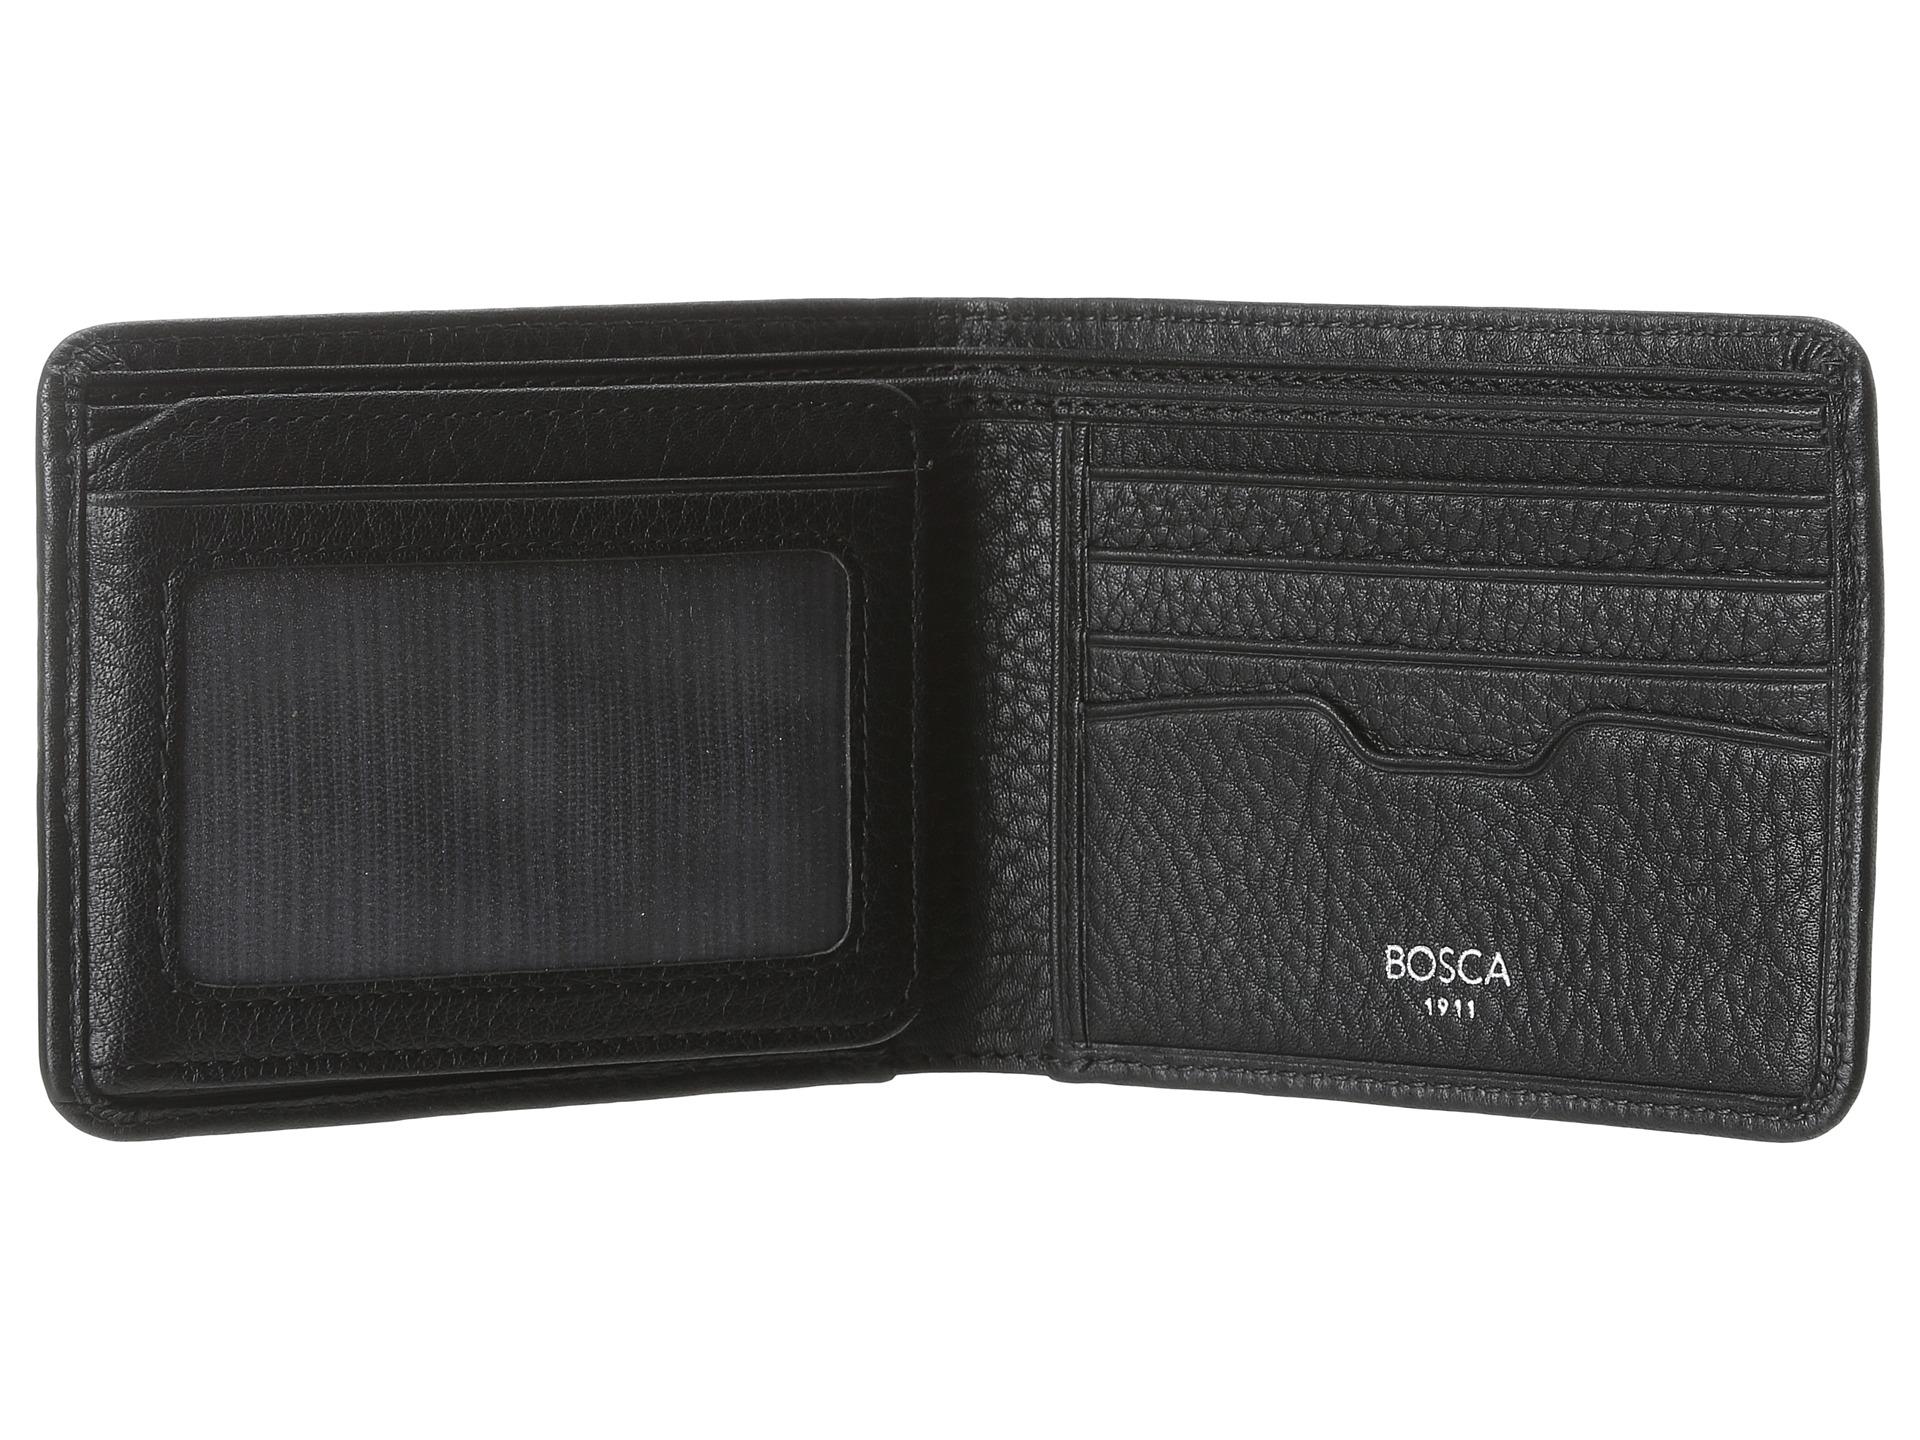 b105d9d77dc7 Lyst - Bosca Tribeca Continental Id Wallet in Black for Men